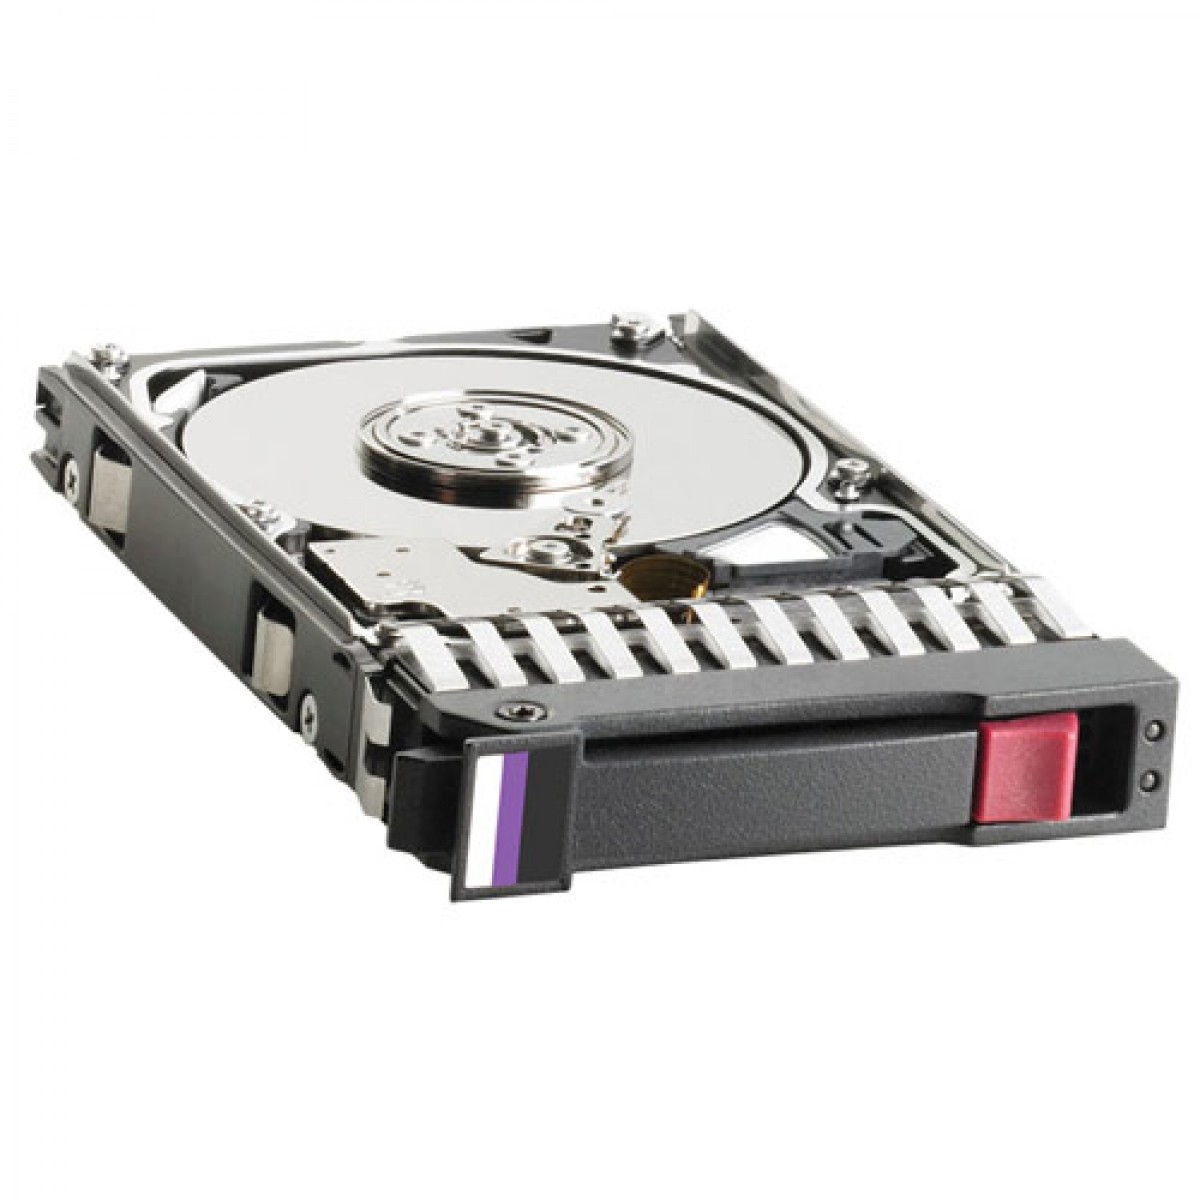 "Hewlett Packard Enterprise Hpe Dual Port Enterprise - Hard Drive - 72 Gb - Hot-swap - 2.5"" Sff - Sas - 15000 Rpm 418371-b21 - xep01"